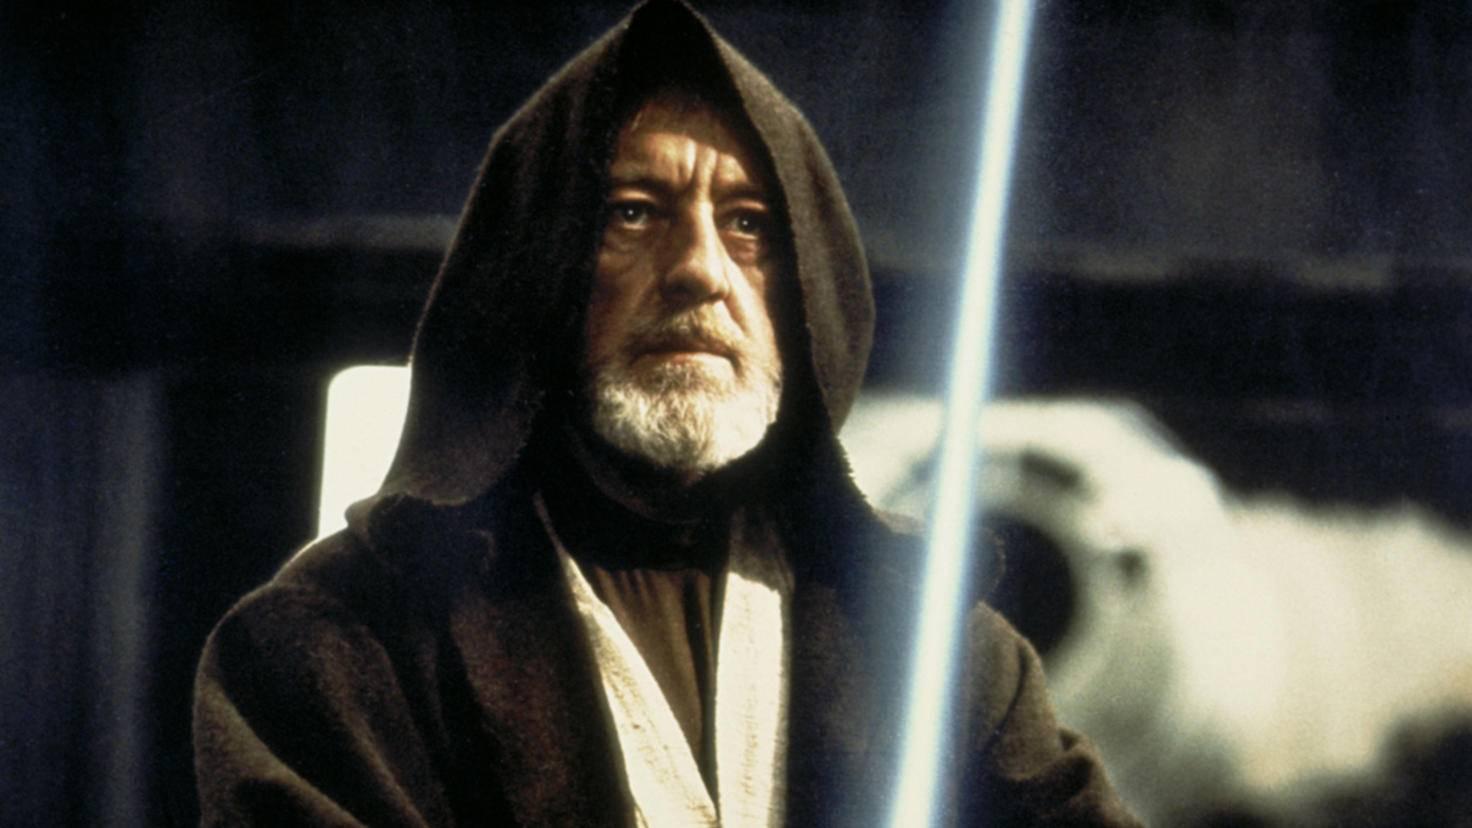 Alec Guinness Star Wars Episode 4-picture alliance-kpa-7211249--